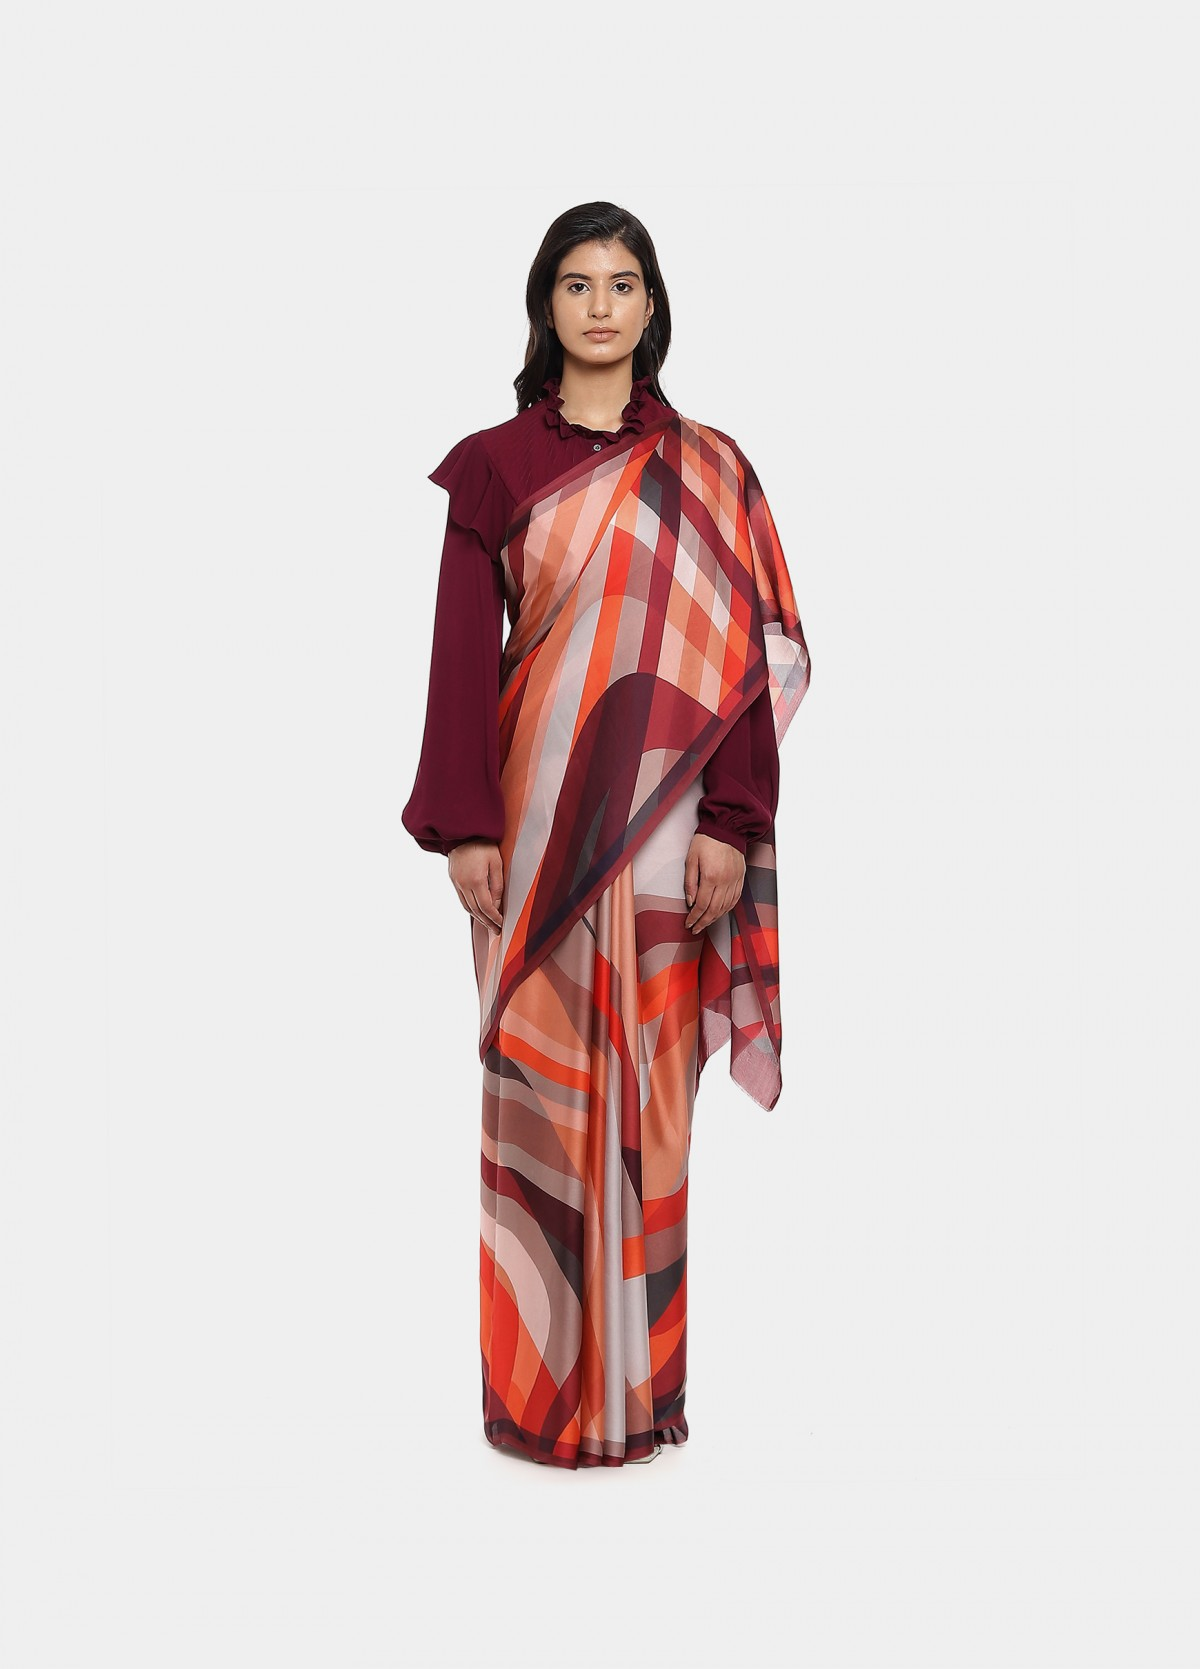 The Heat Waves Sari